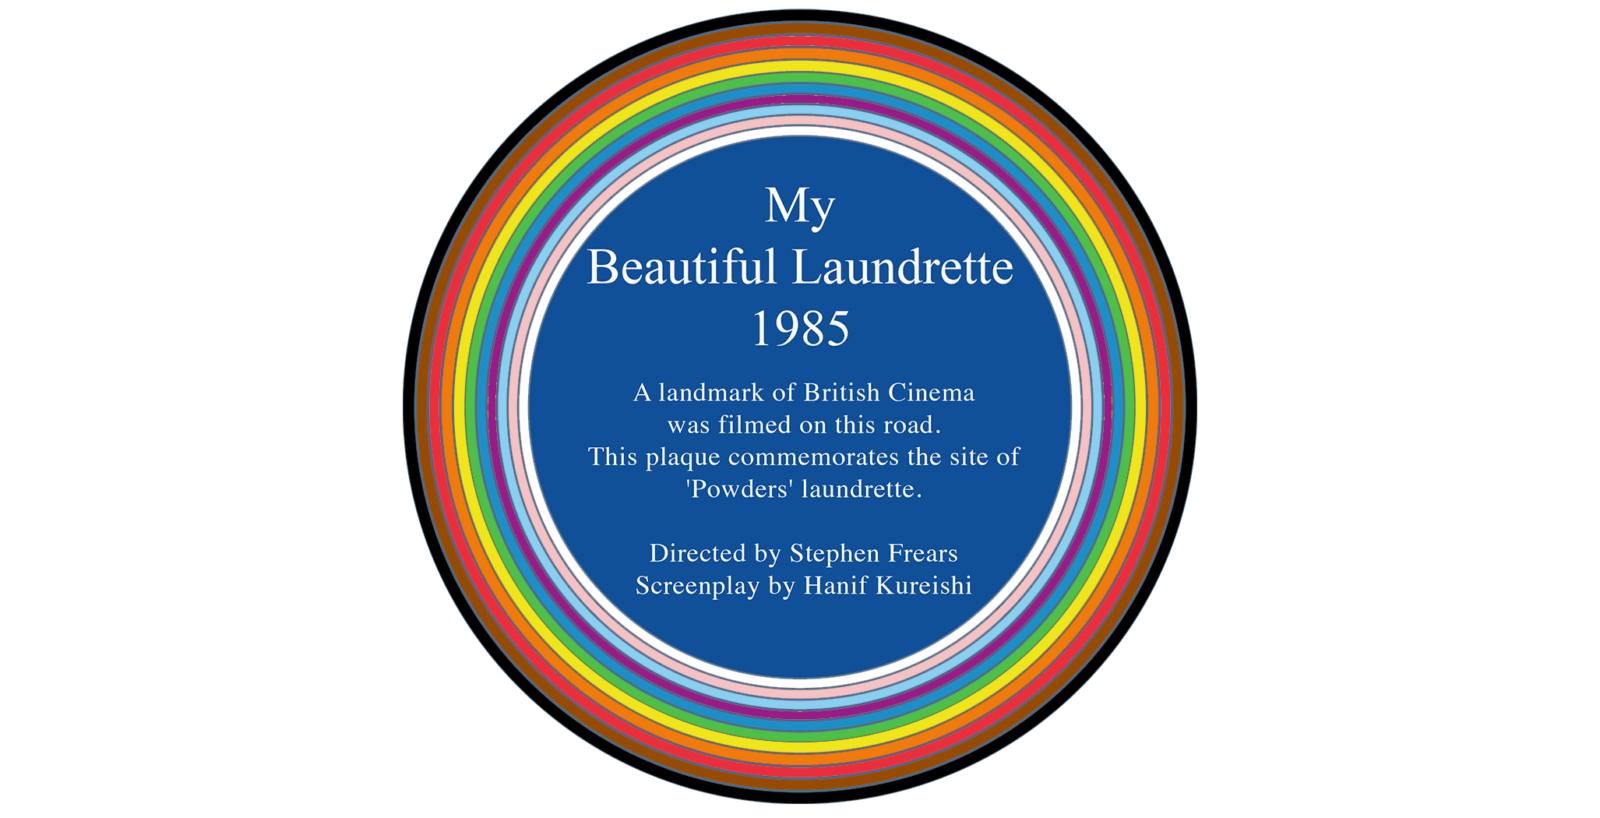 Rainbow plaque for My Beautiful Laundrette